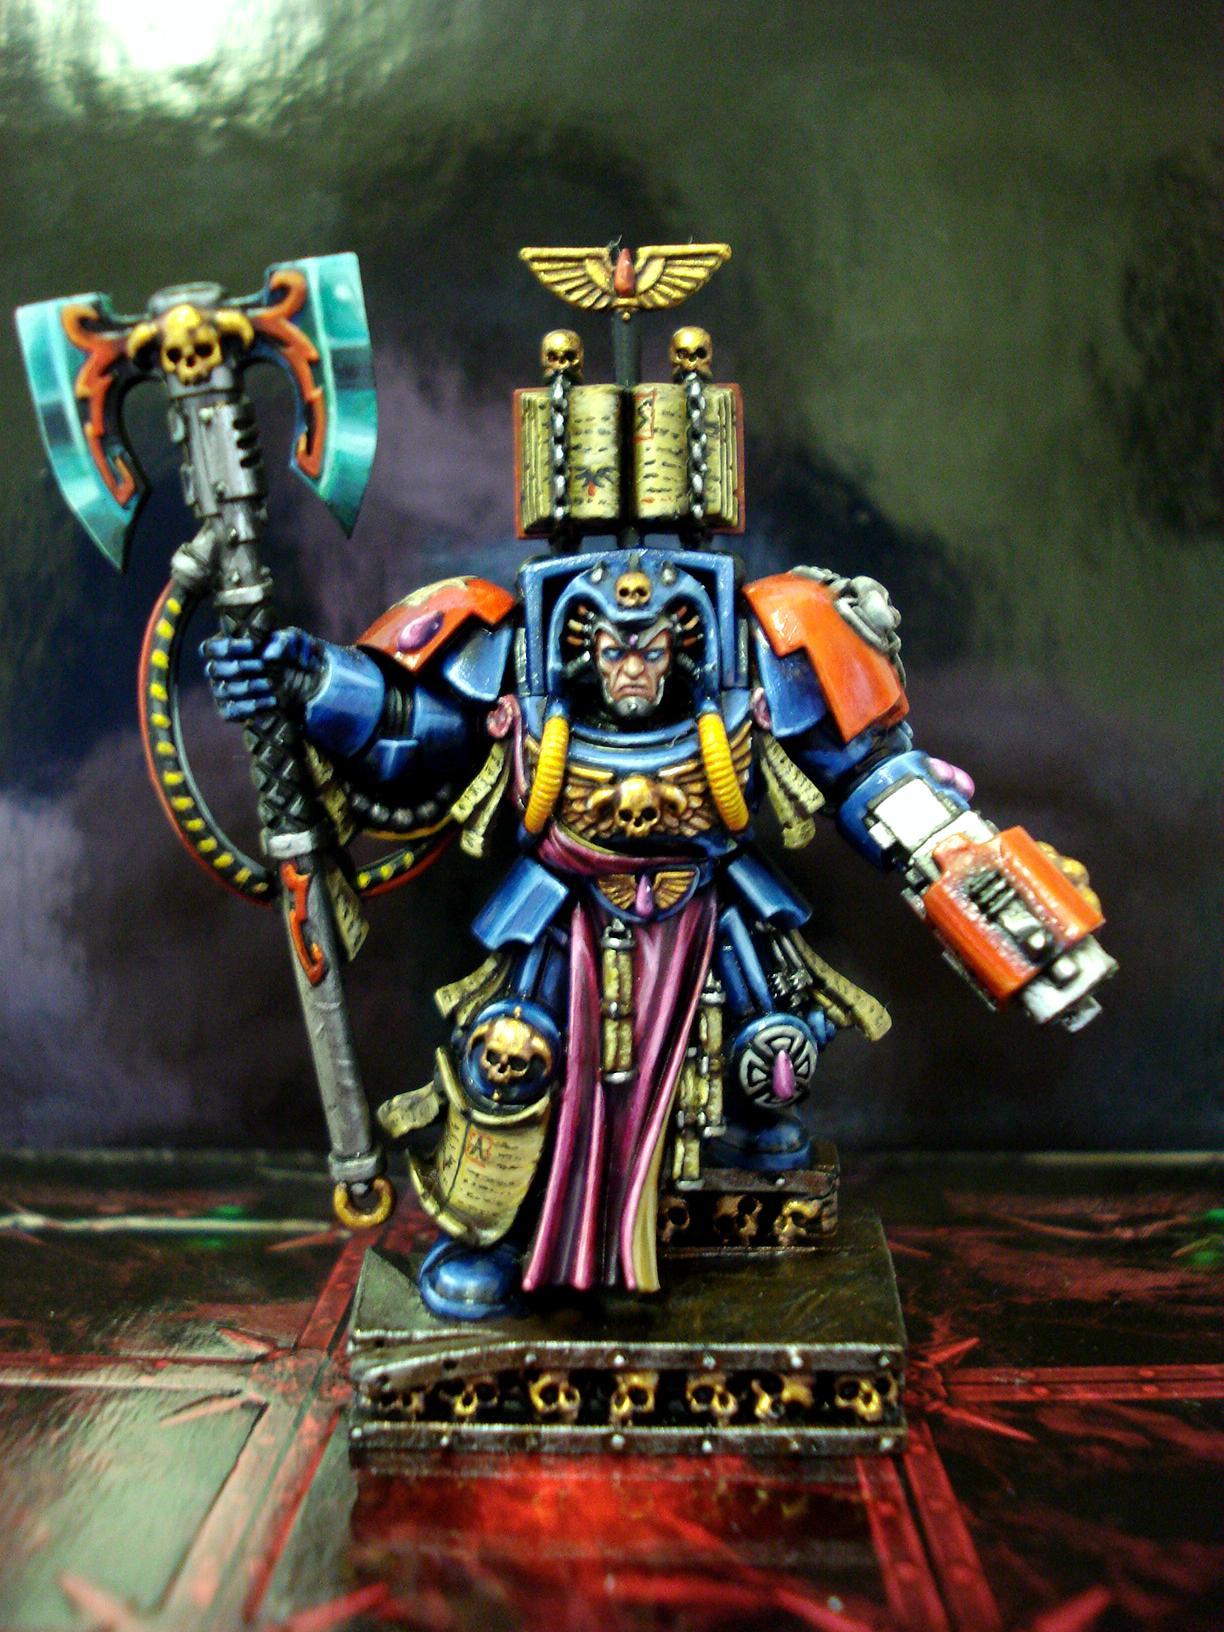 Blood Angels, Games Workshop, Librarian, Space Hulk Terminator Armour, Space Marines, Terminator Armor, Warhammer 40,000